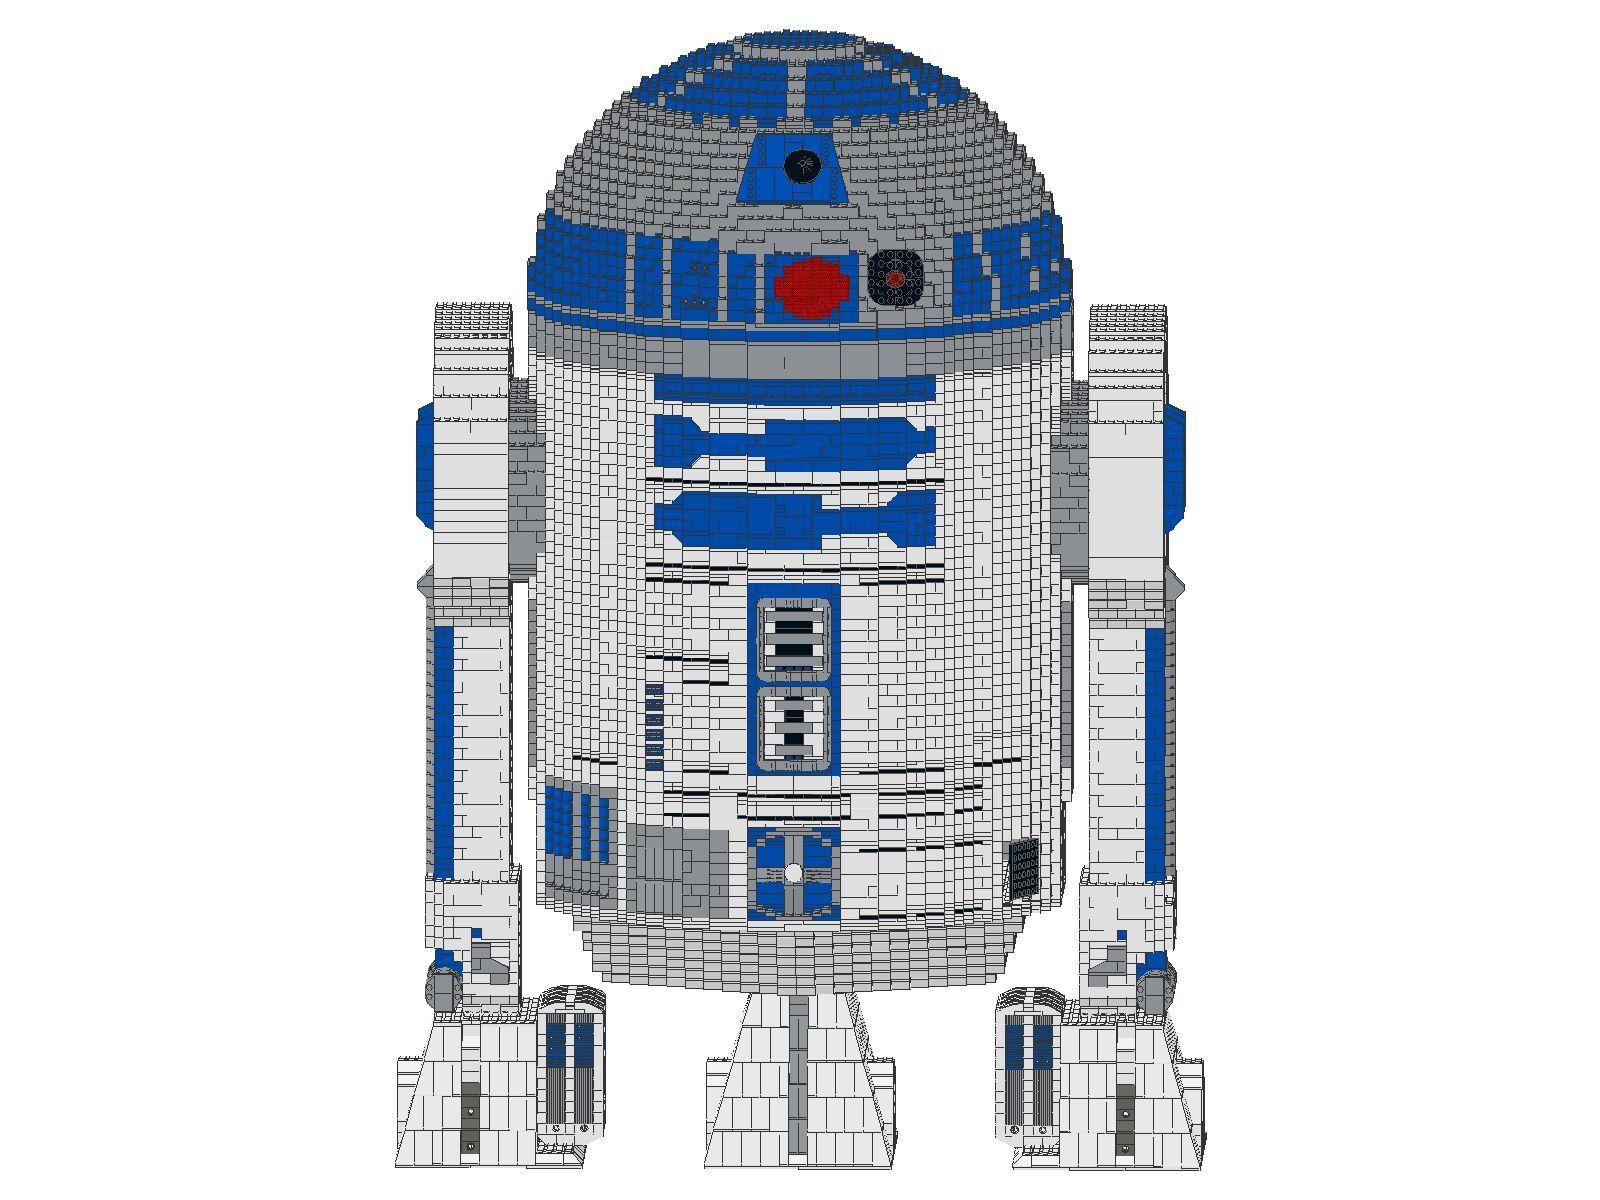 Bauanleitung instruction R2D2 10225 Star Figur Sculptur Eigenbau Eigenbau Eigenbau Unikat Moc Lego f27226